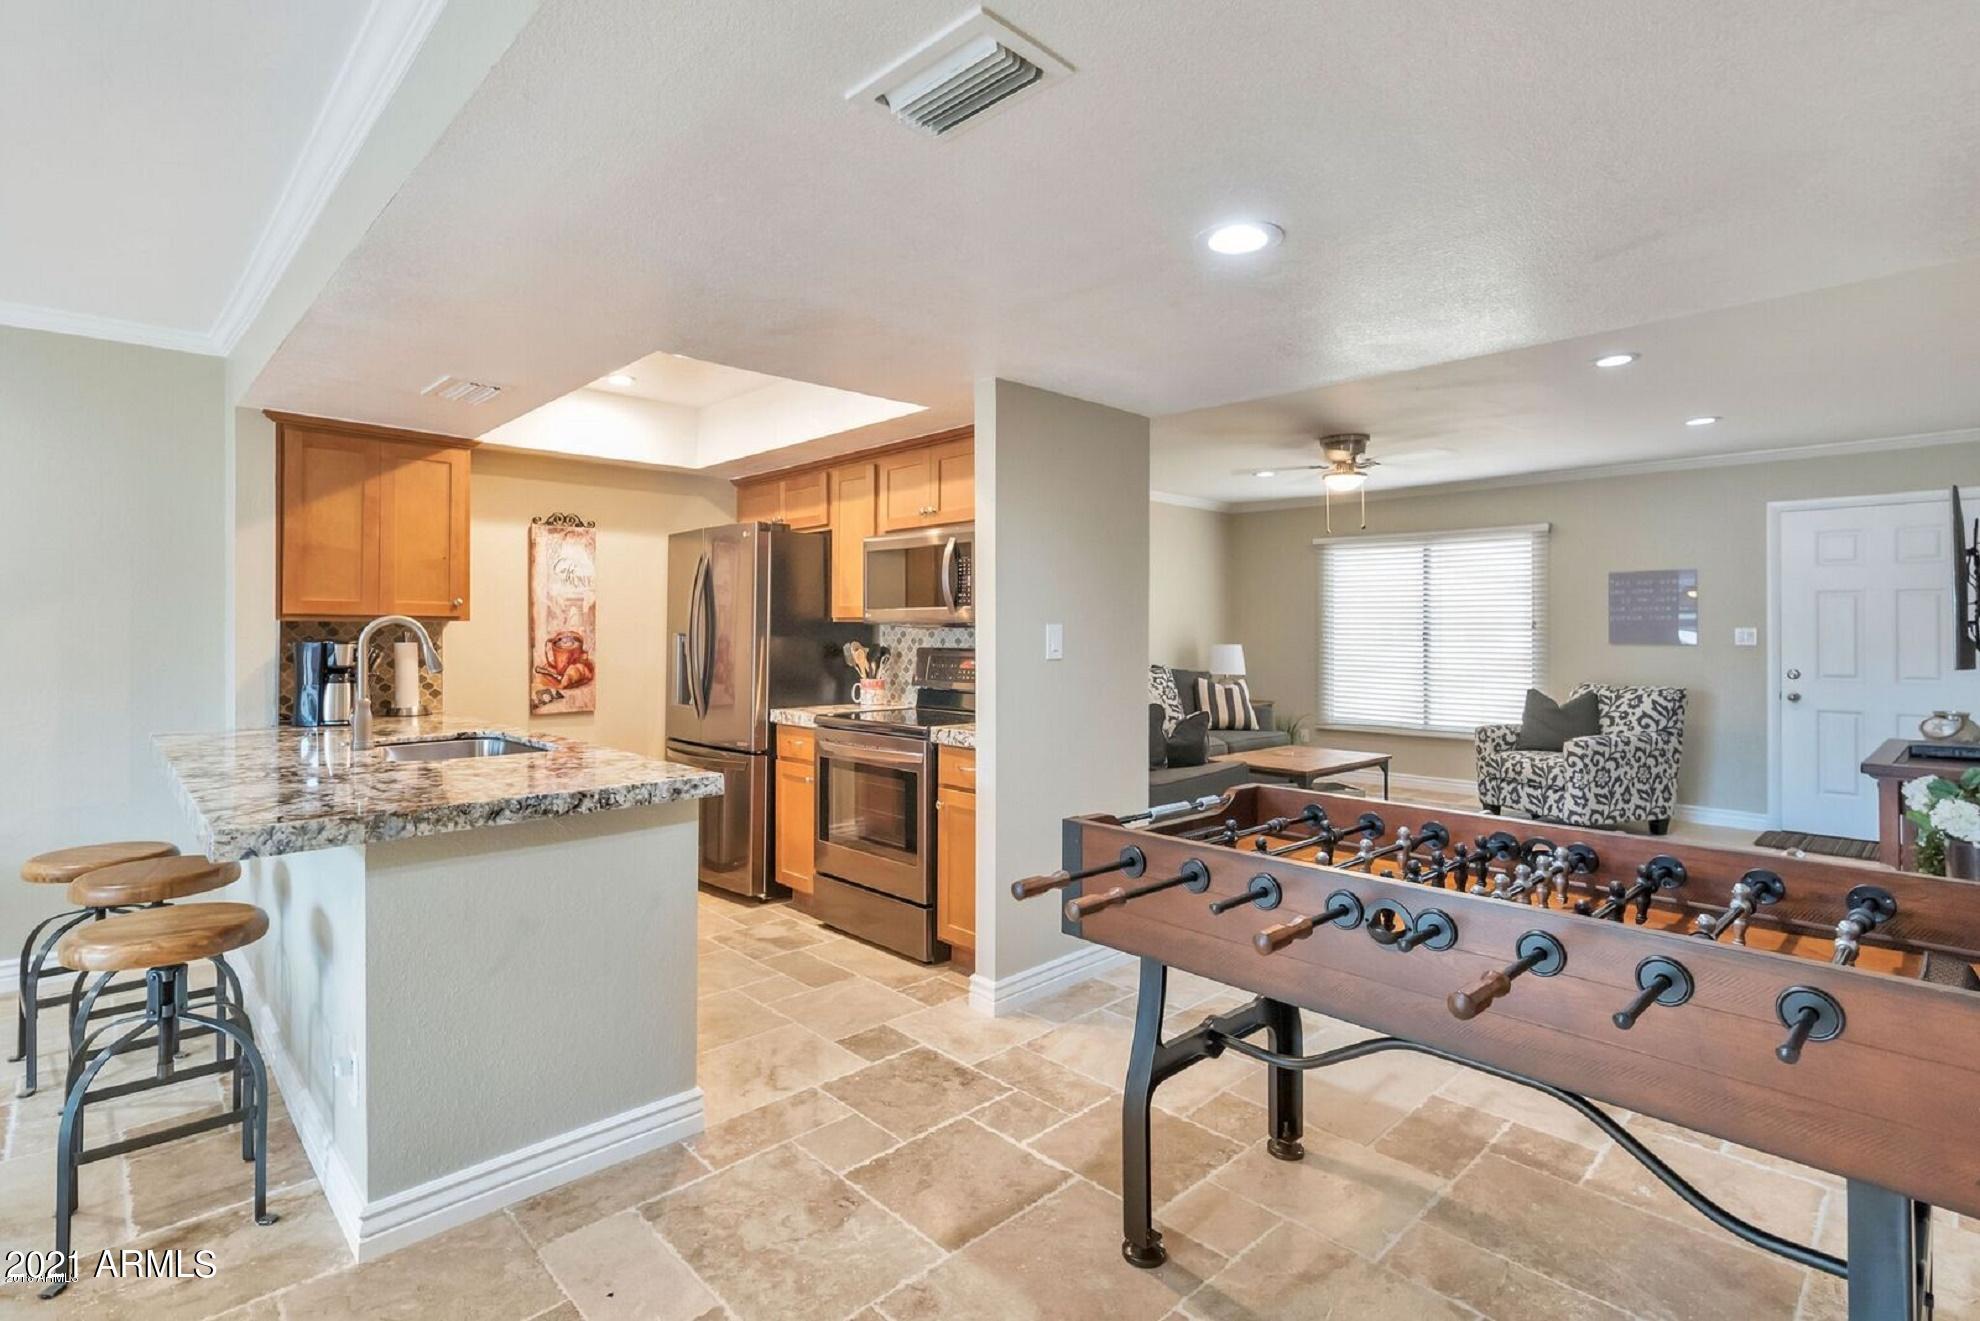 5056 82ND Street, Scottsdale, Arizona 85250, 3 Bedrooms Bedrooms, ,2 BathroomsBathrooms,Residential,For Sale,82ND,6230968